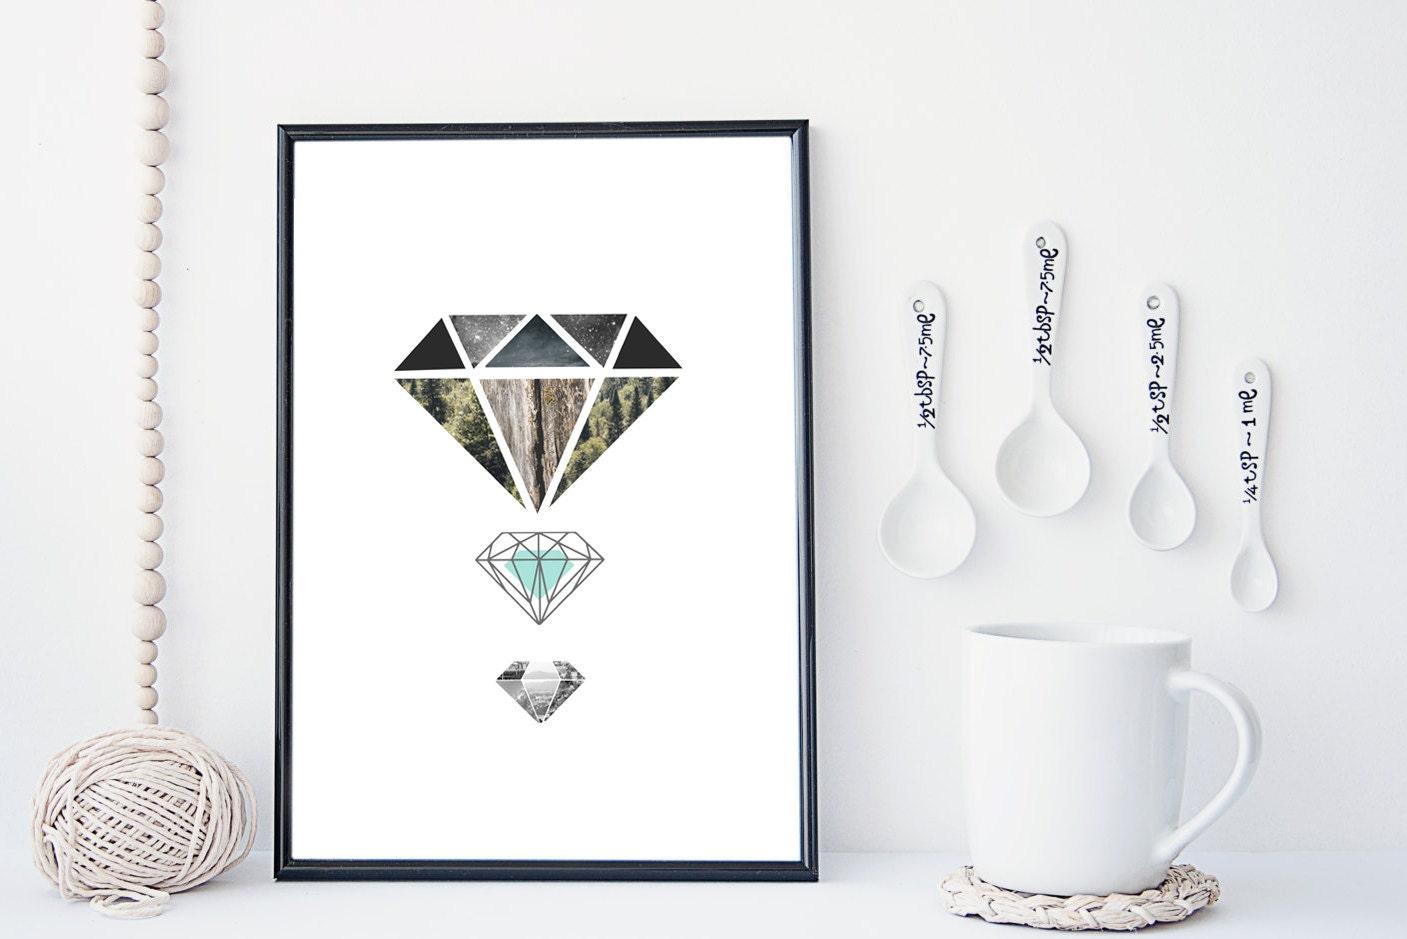 Wall Decor With Crystal : Diamond art print crystal wall geometric modern